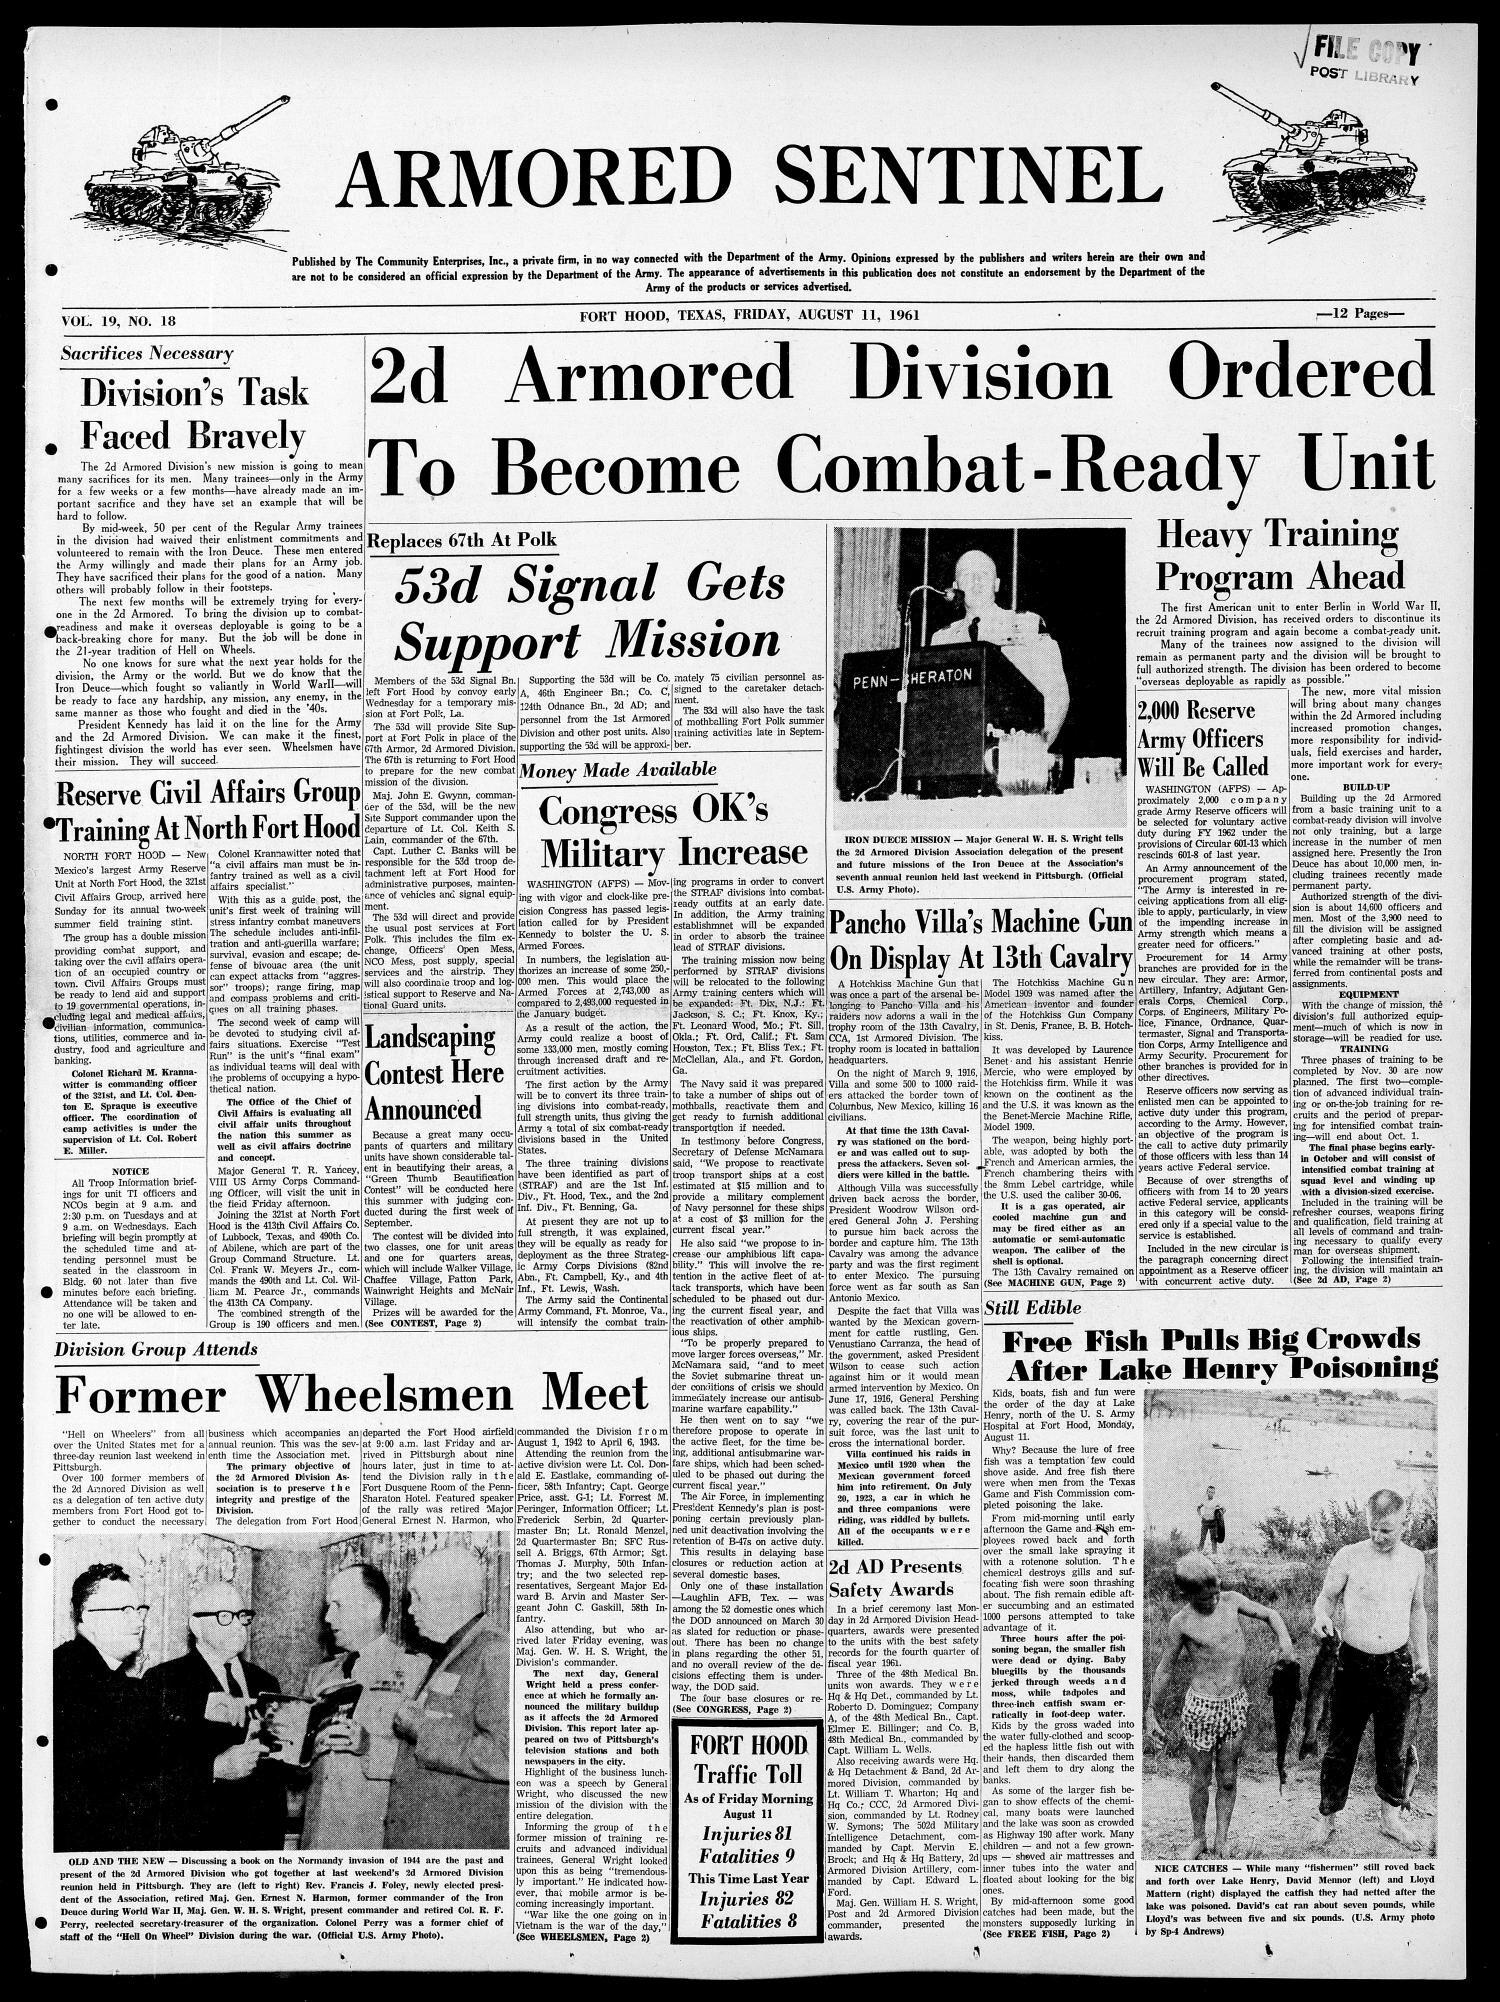 ARMORED SENTINEL_11 AUG 1961.jpg